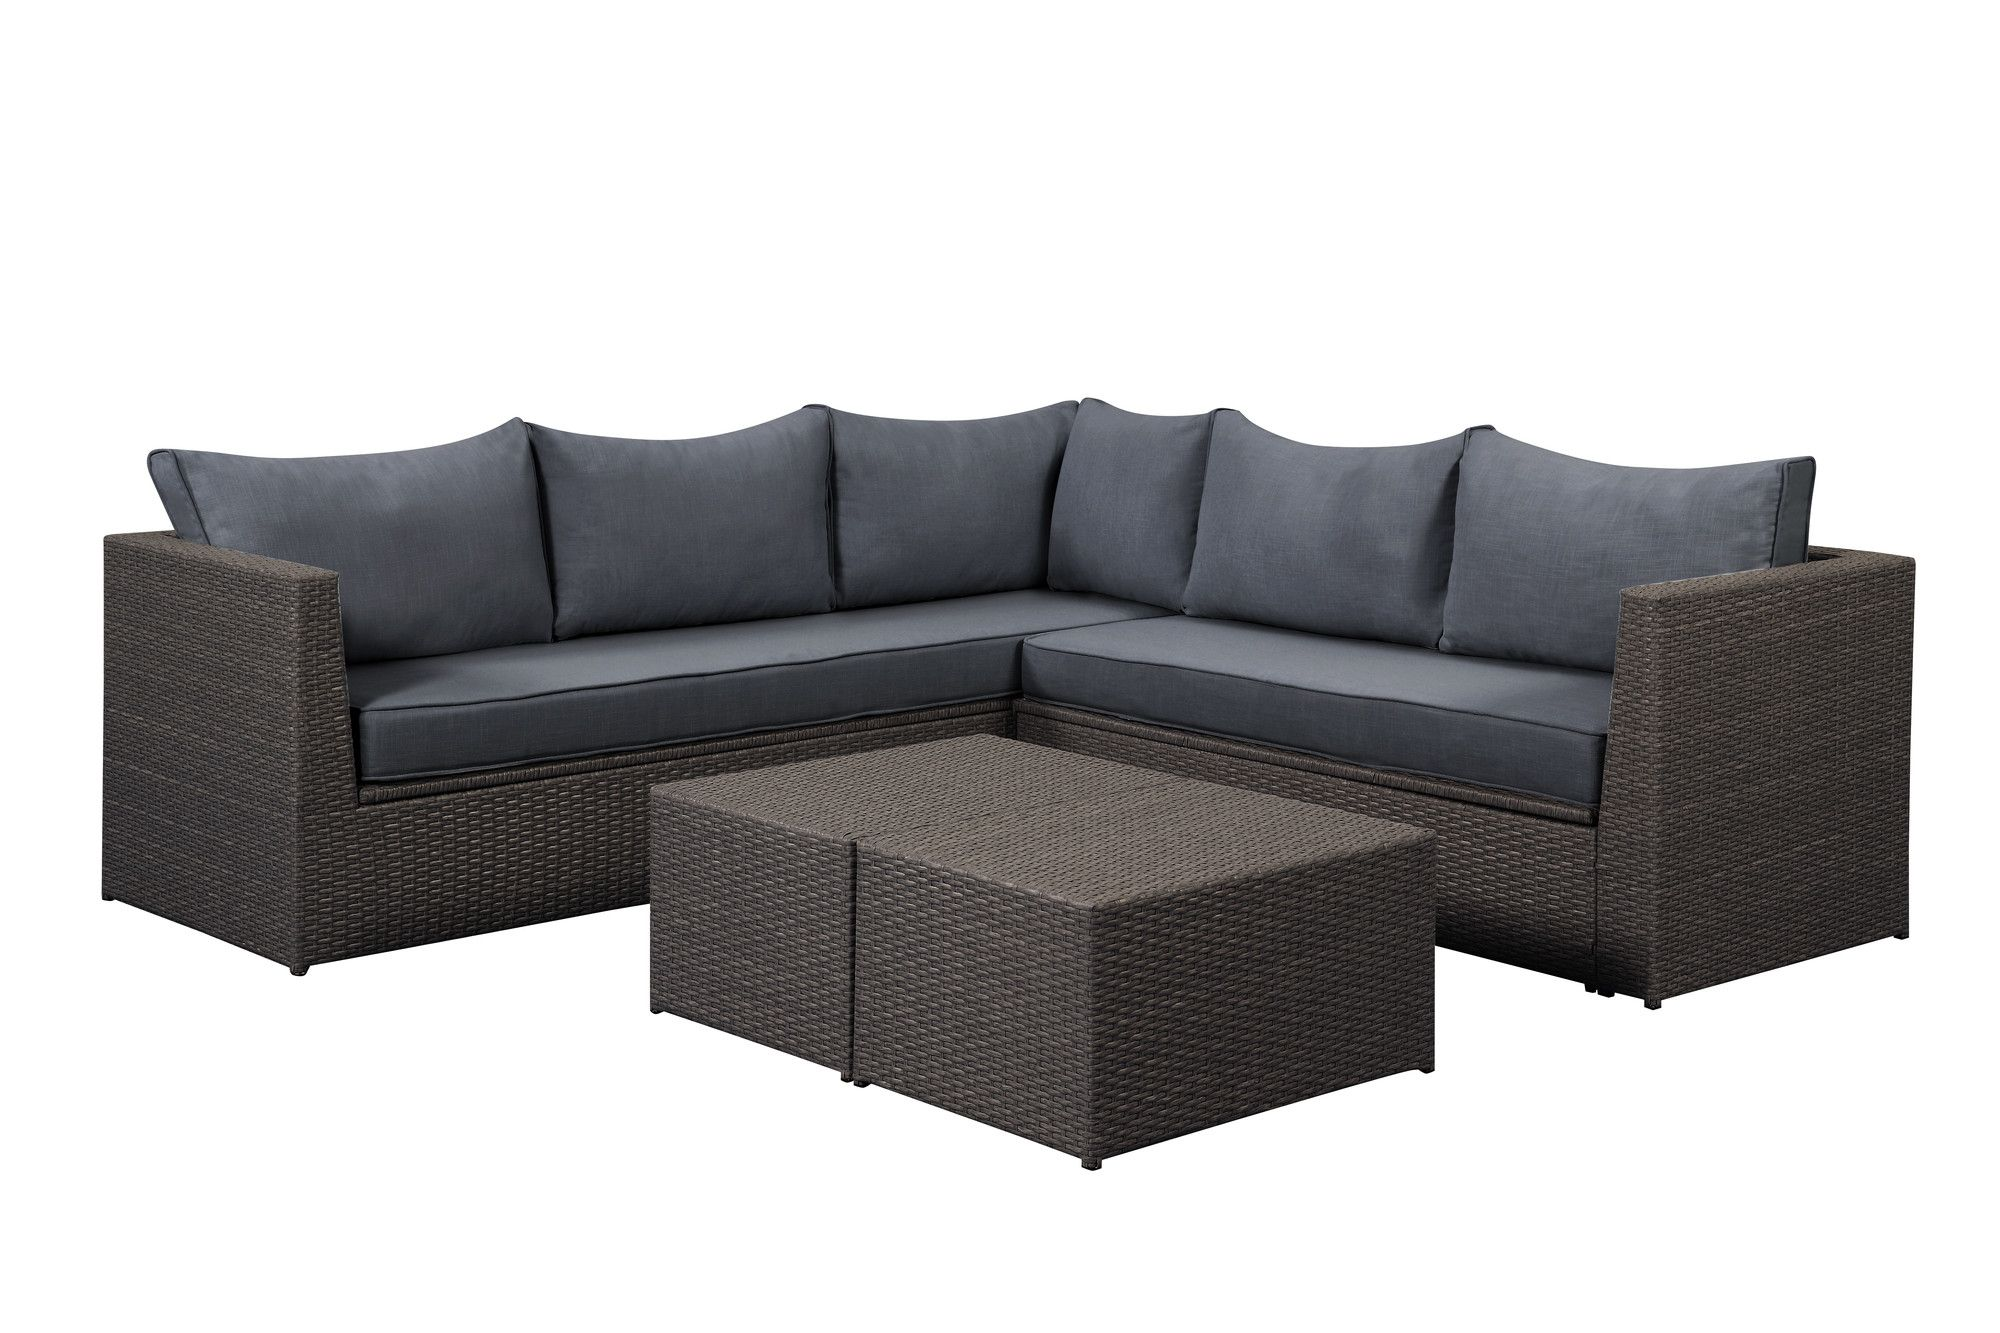 Morro Bay Sectional W Storage Brown Grey Products Outdoor Sofa Sets Outdoor Sofa Sofa Set